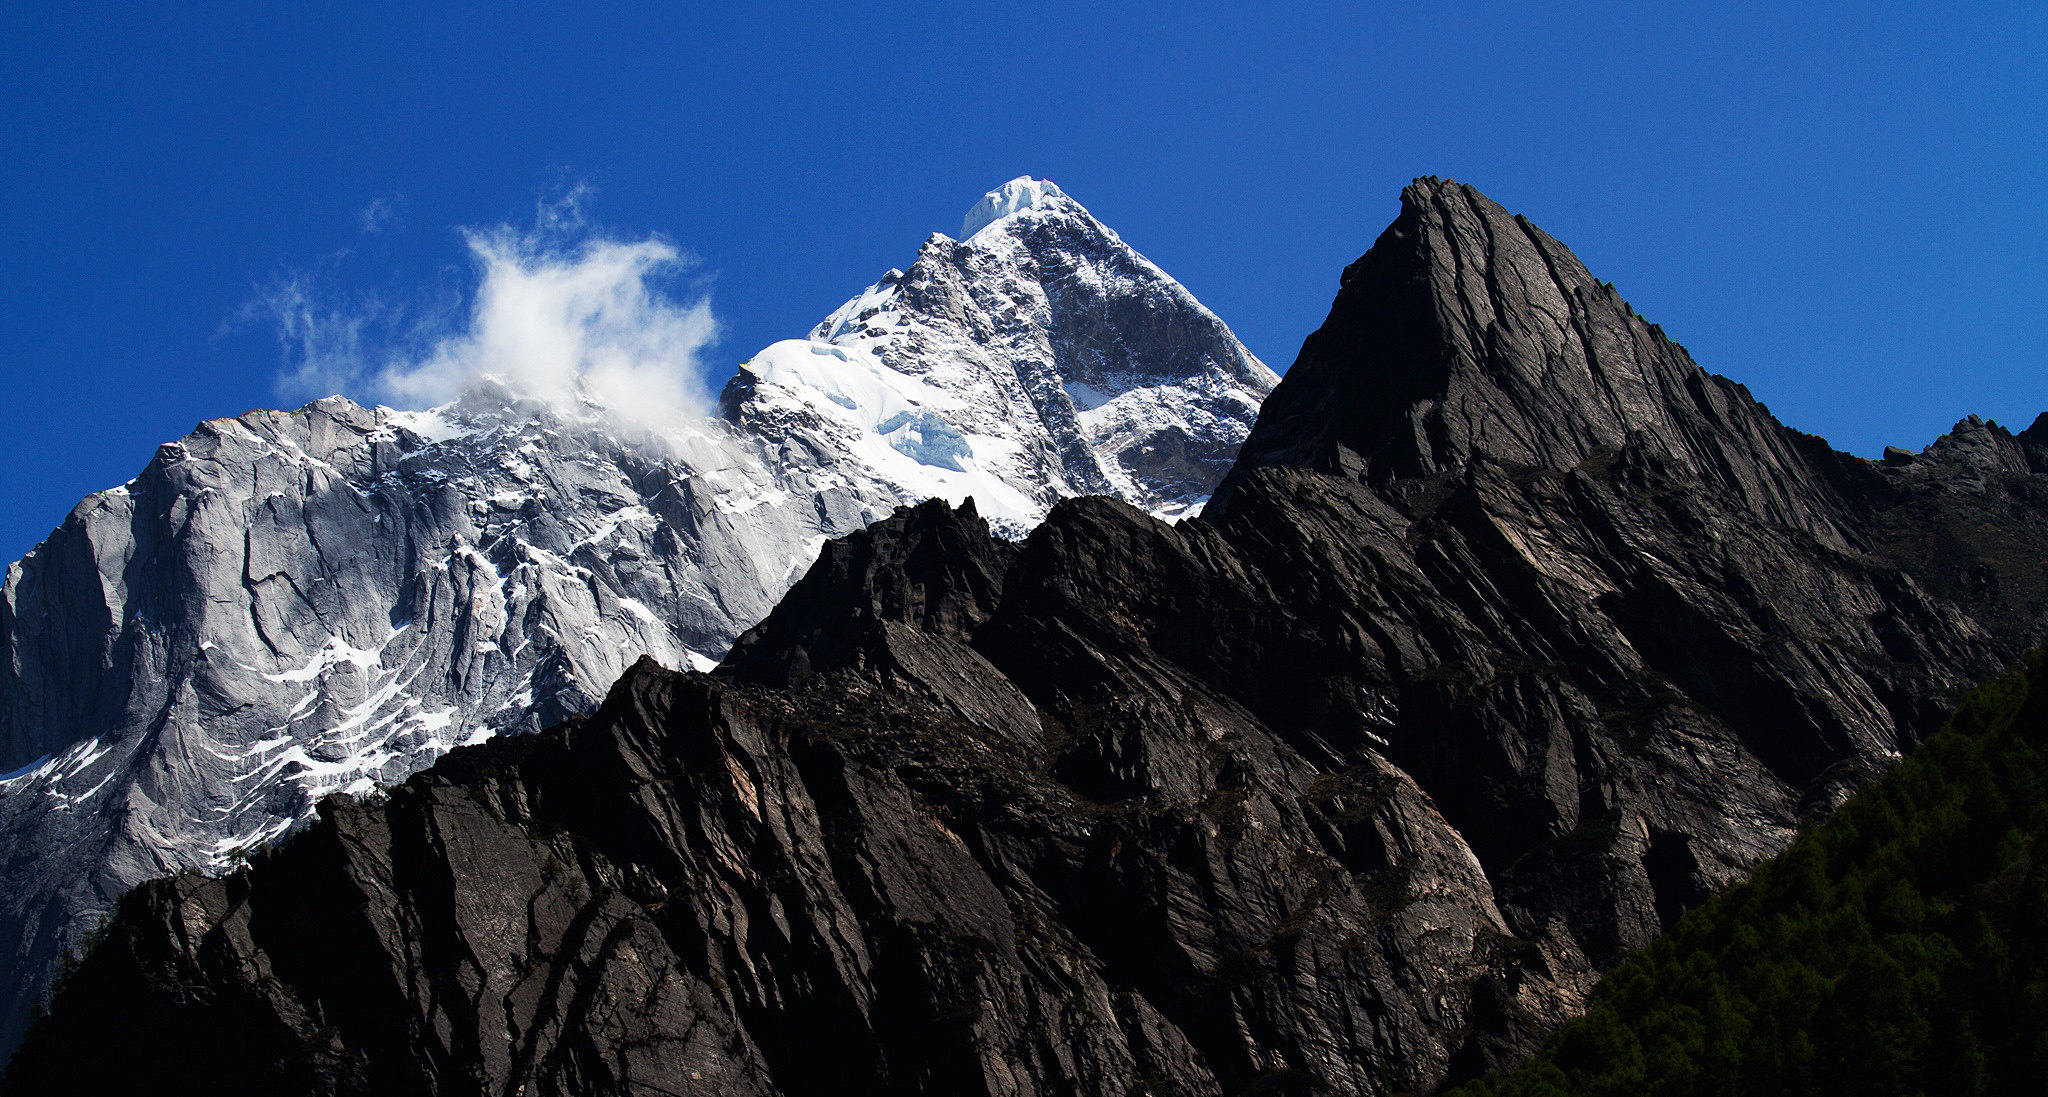 Mount Siguniang (Skubla)